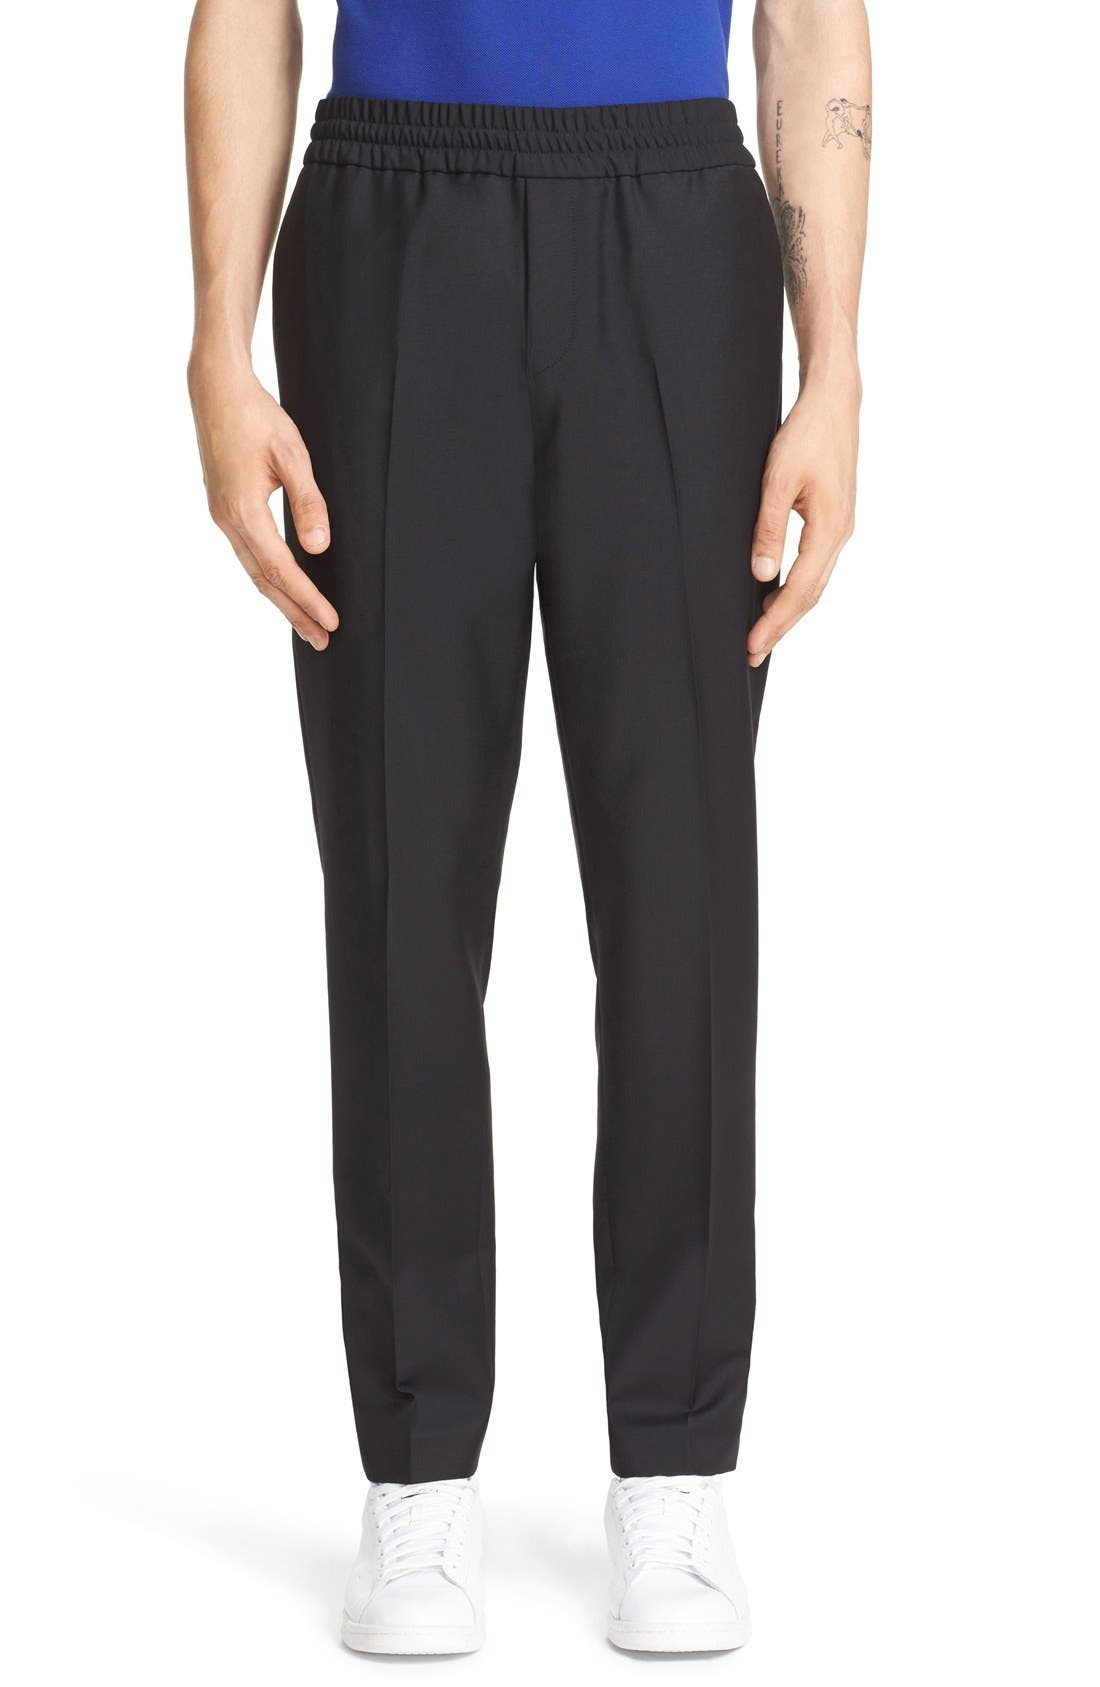 Ryder Wool Pants,                         Main,                         color, 001